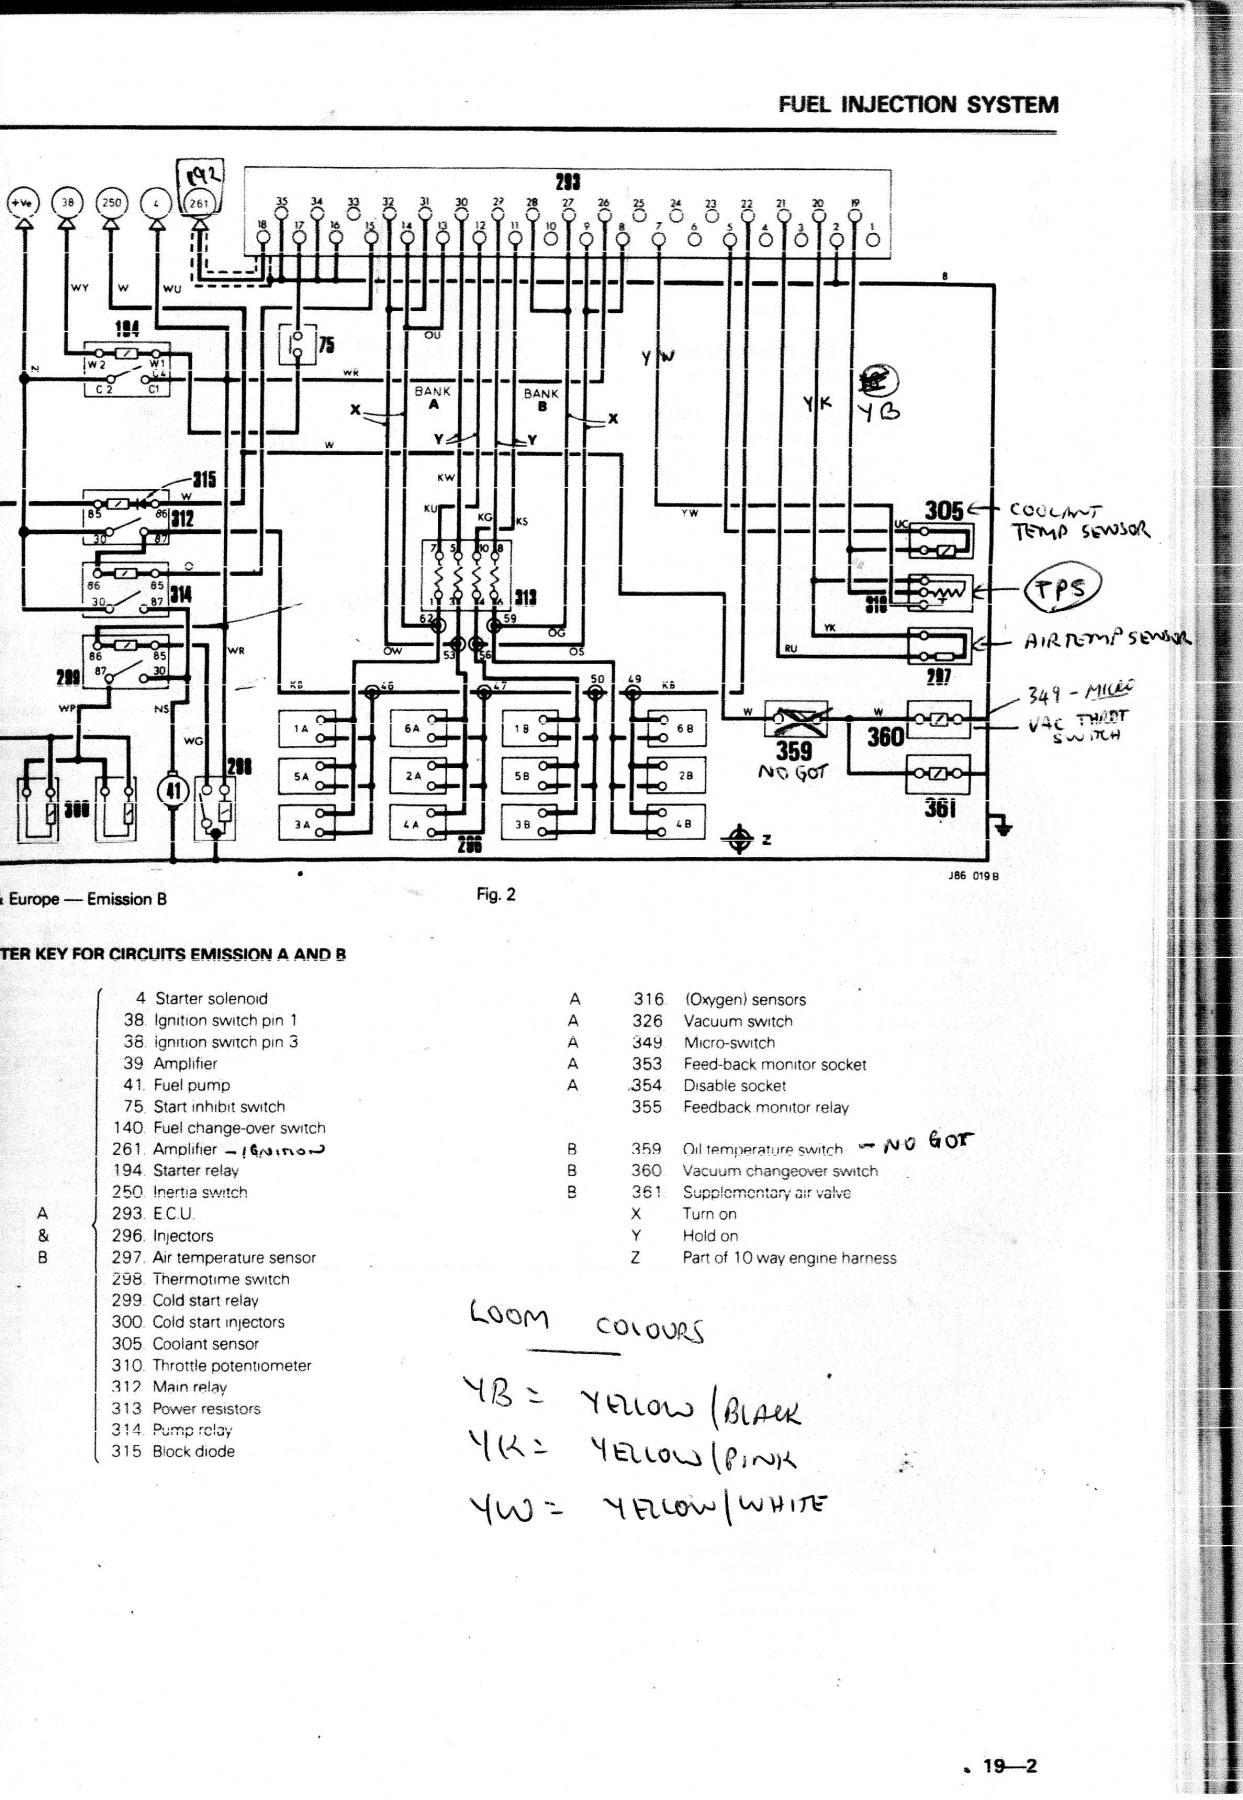 1986 jaguar xj6 wiring diagram